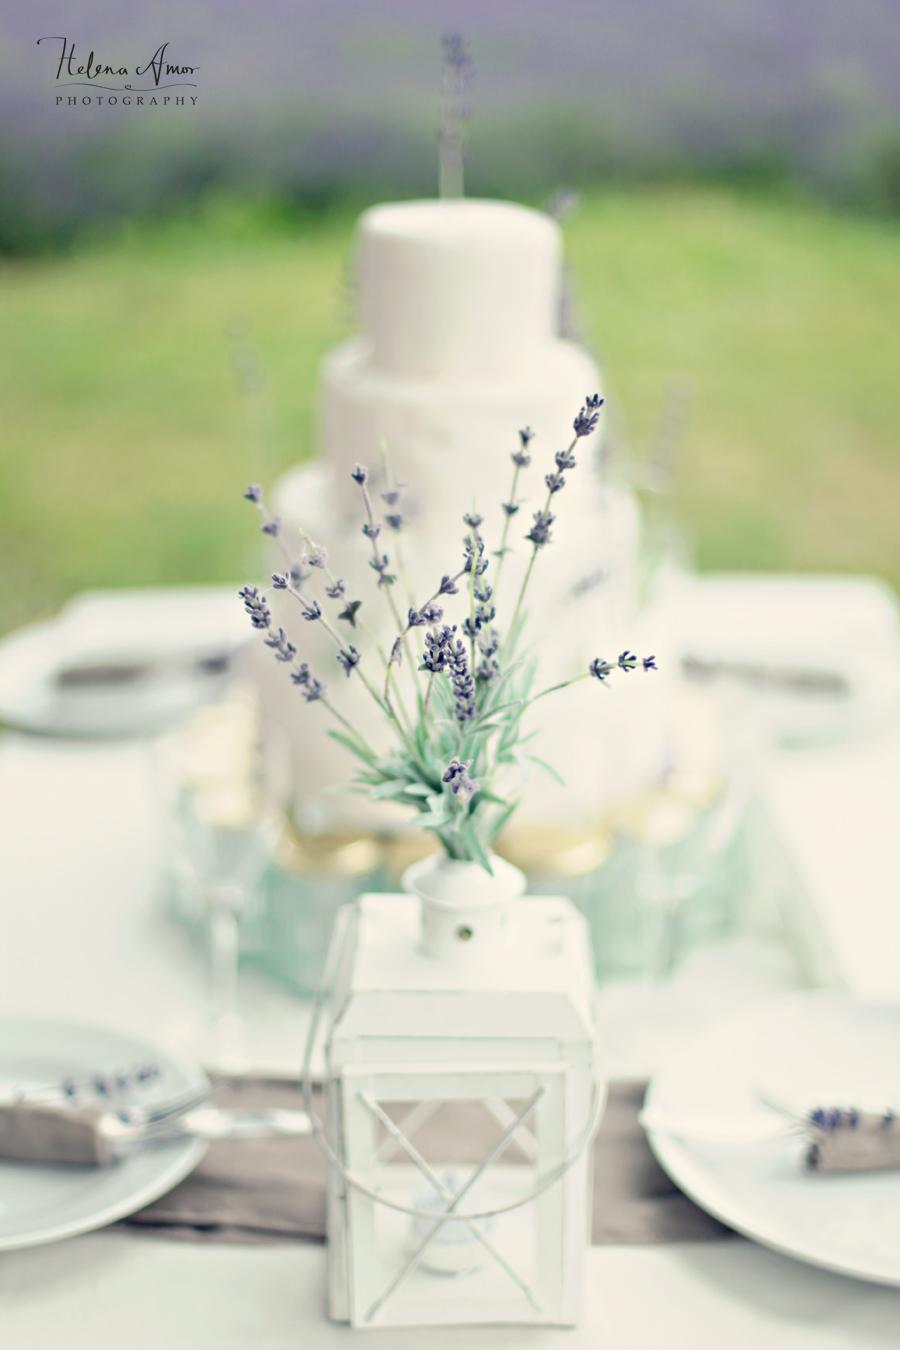 Creative and stylish London wedding photography by Helena Amor ...